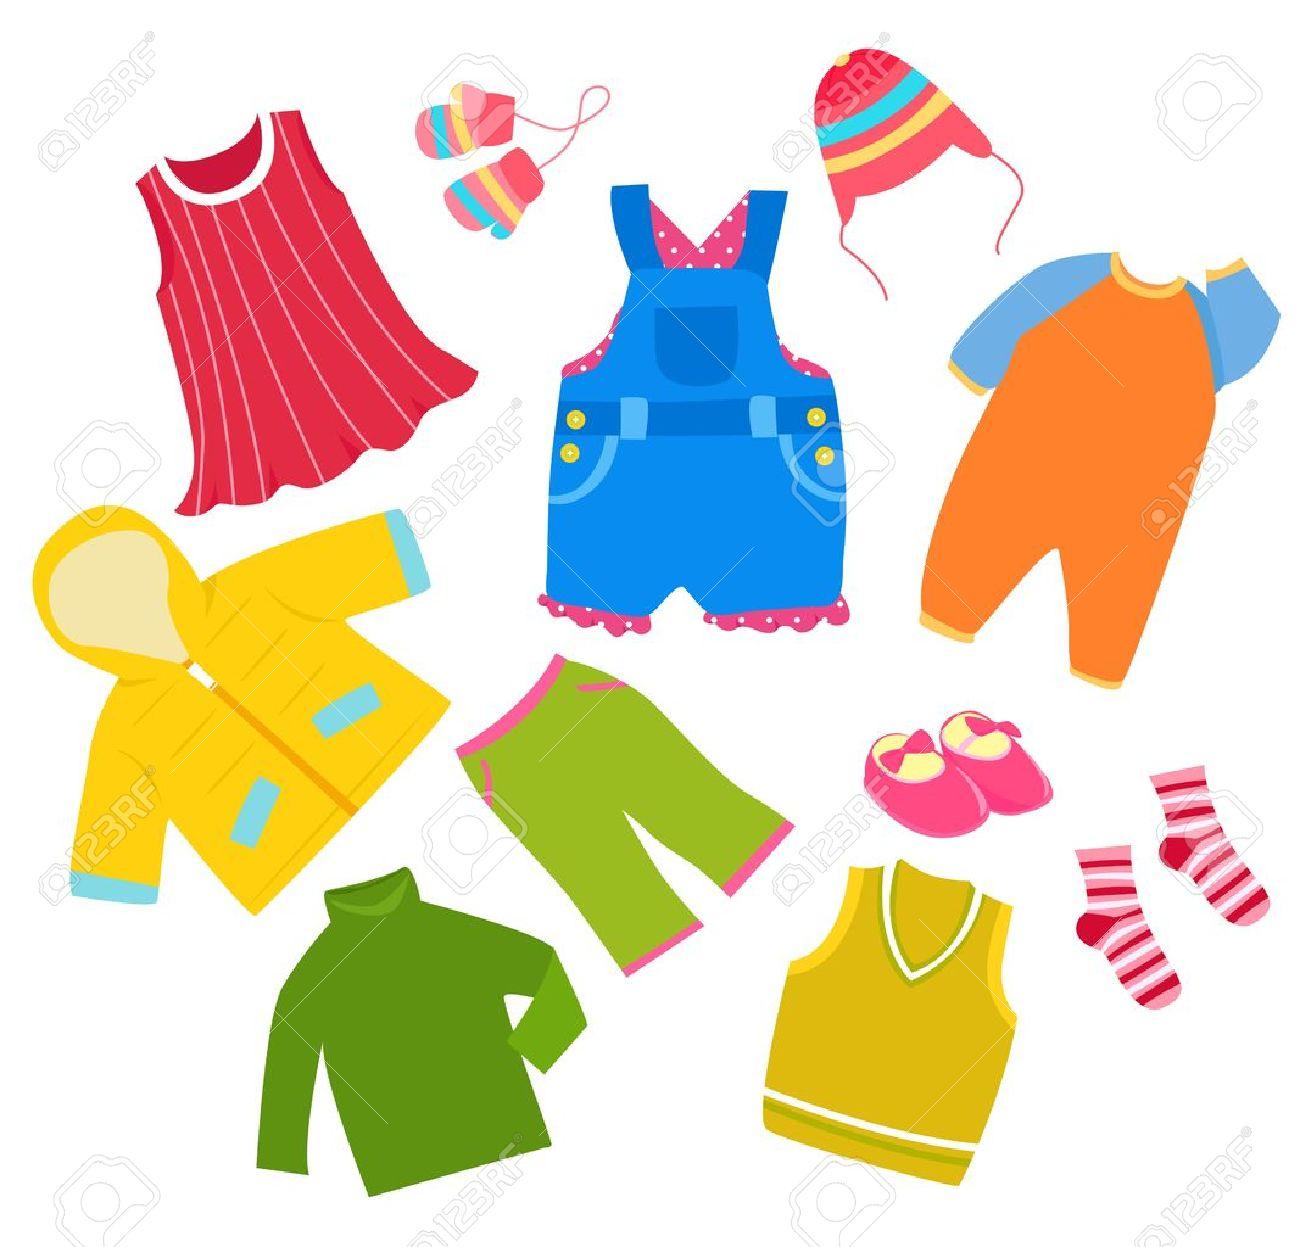 Cothes clipart clipart download Kids clothes clipart 7 » Clipart Station clipart download